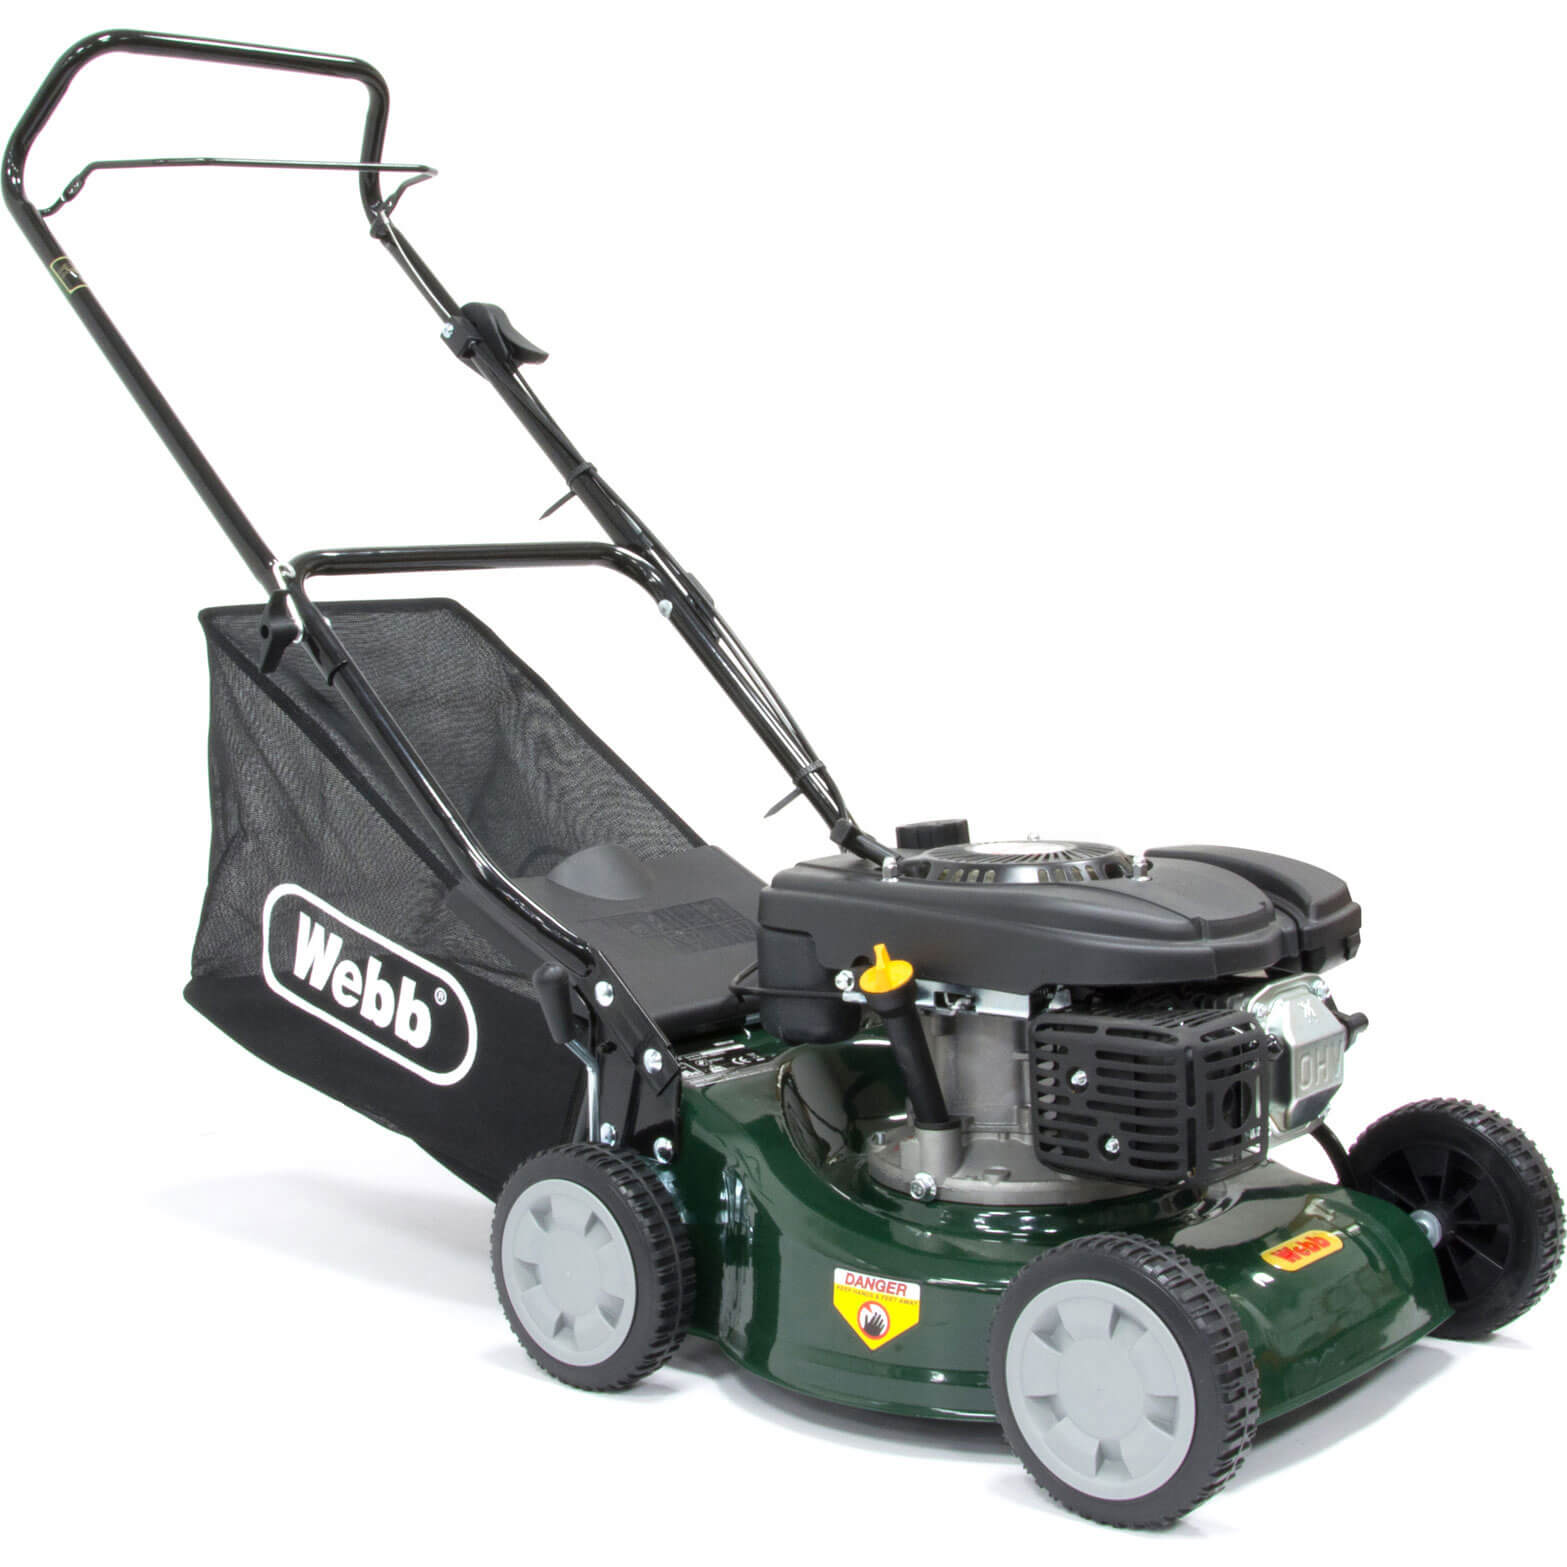 Image of Webb WER41HP Push Petrol Rotary Lawnmower 400mm